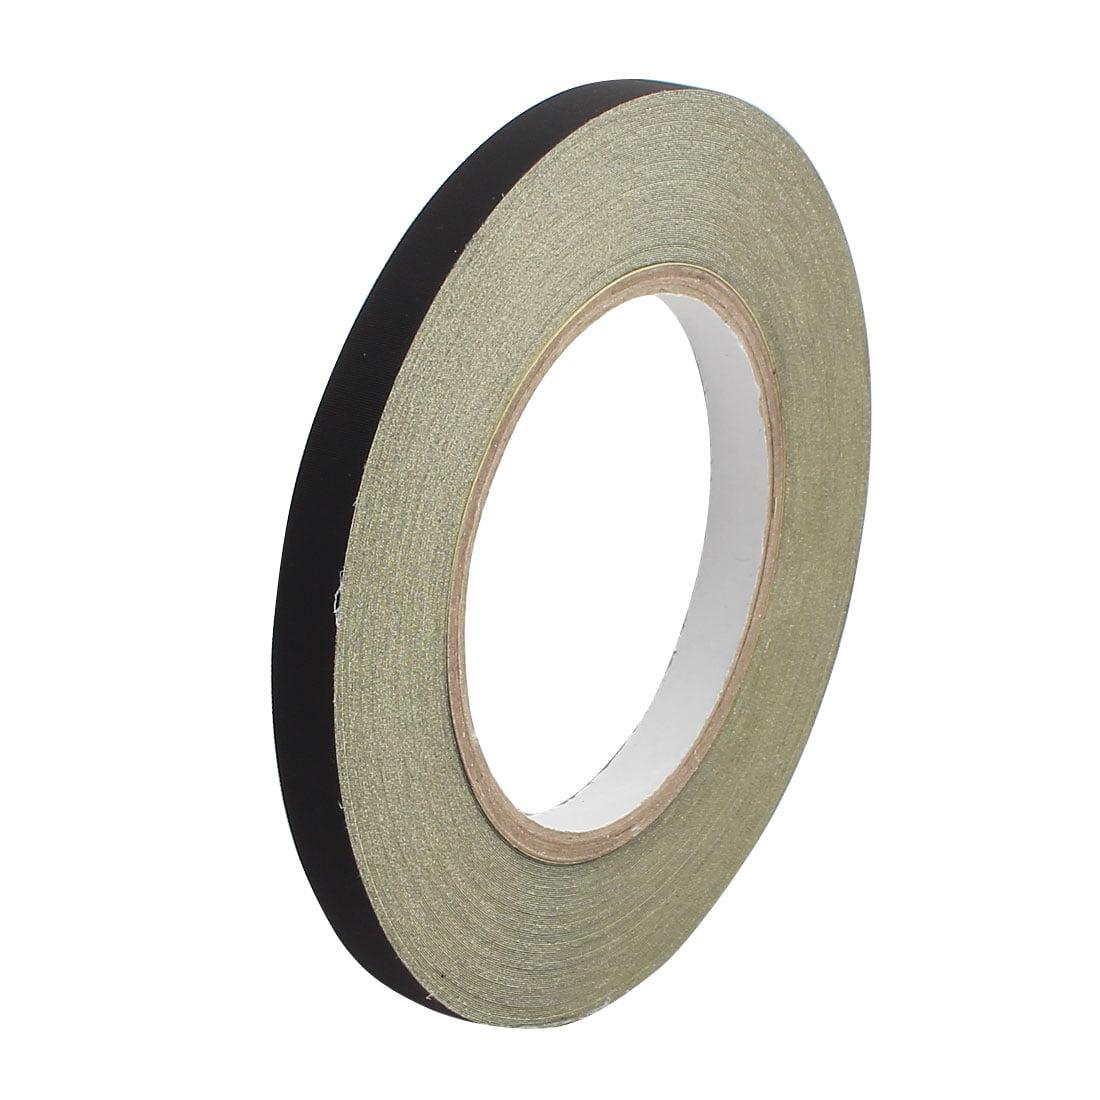 10mm Width Black Insulating Acetate Cloth Adhesive Tape For Laptop Transformer - image 3 de 3